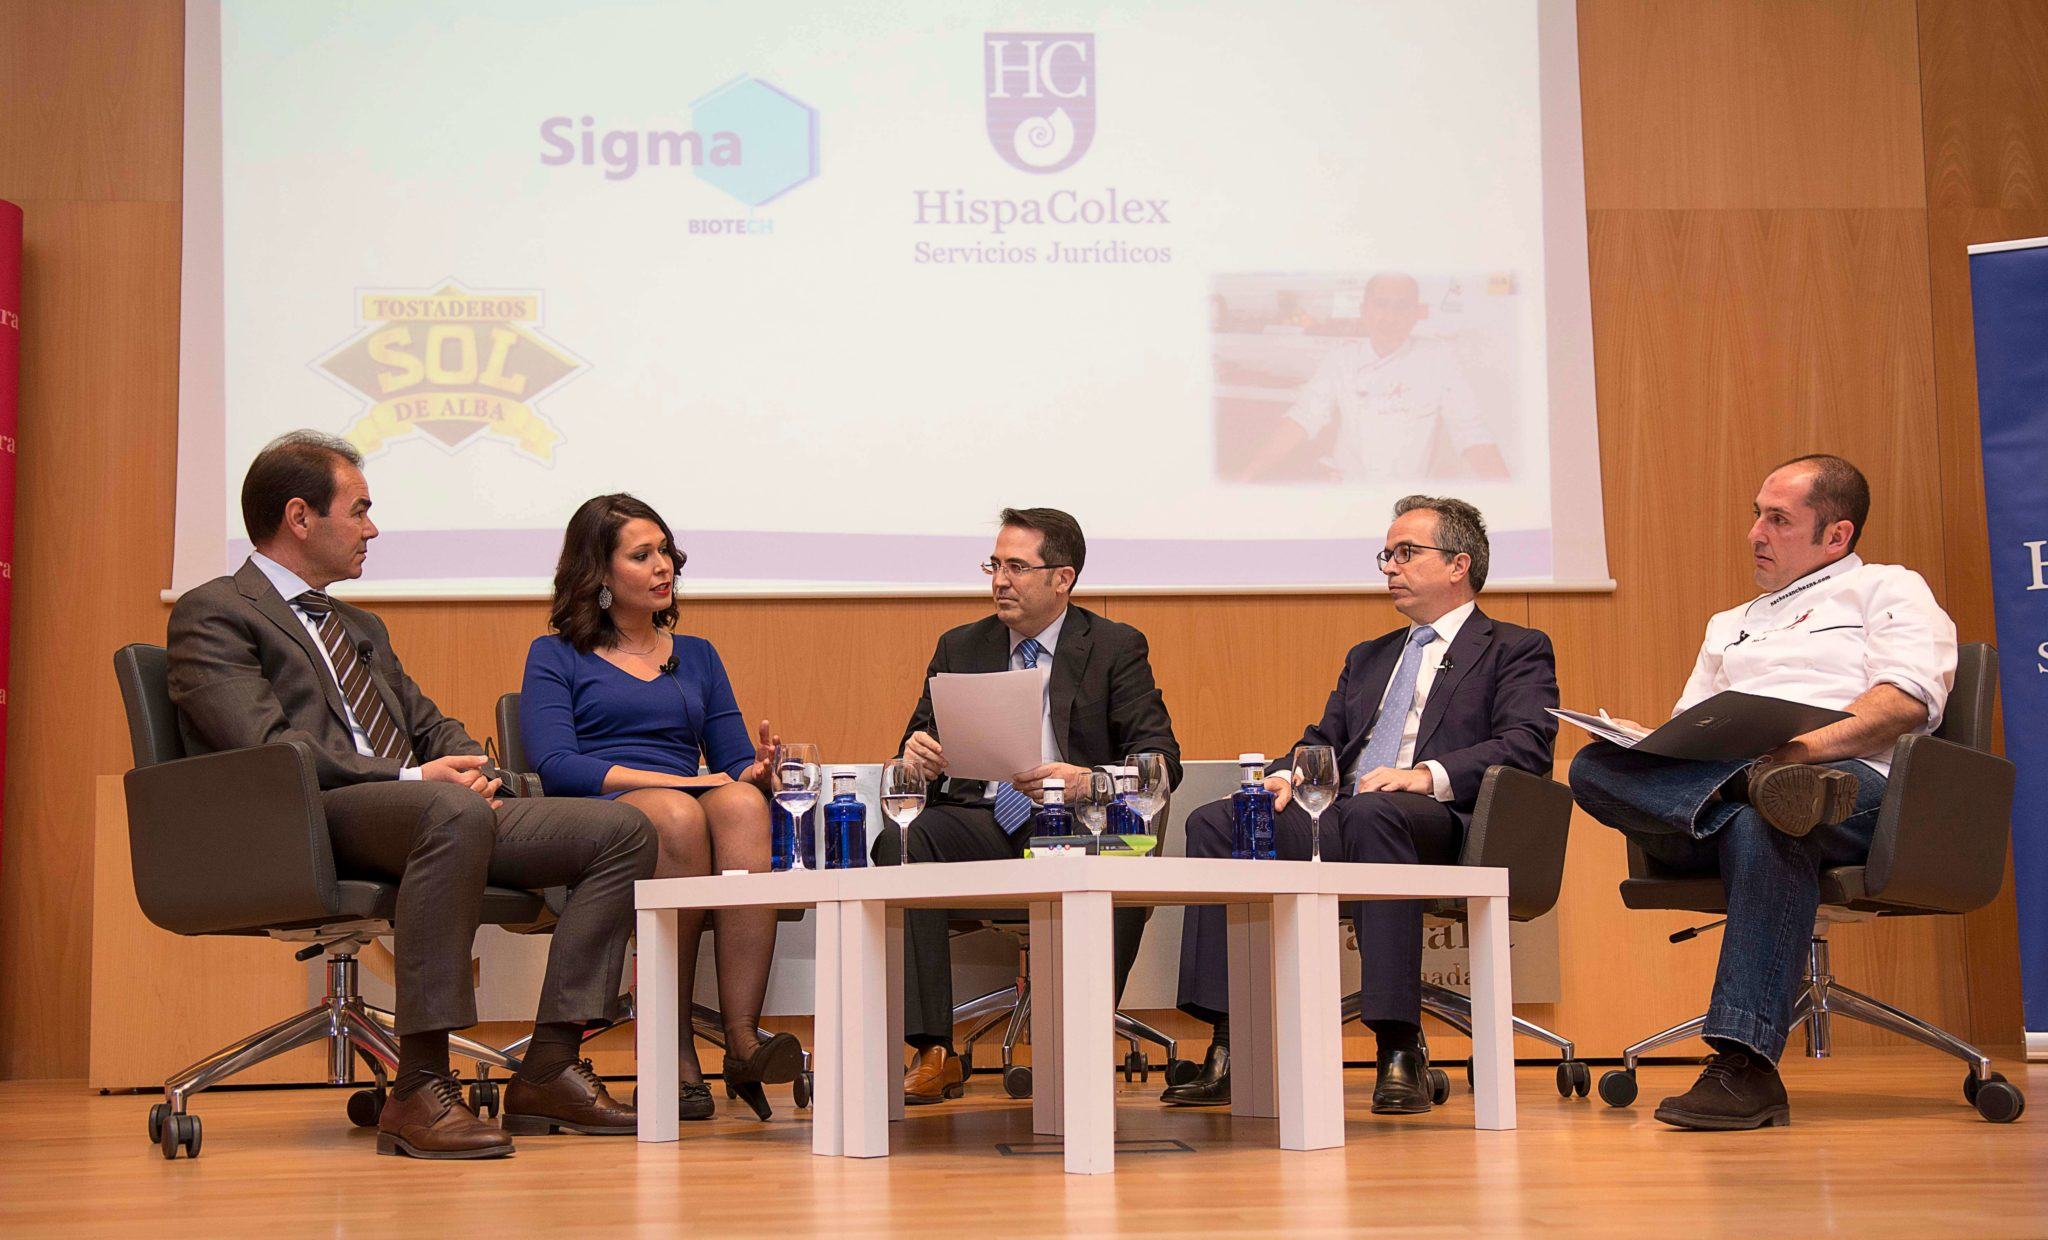 jornadas-innovacion-sigmabiotech-y-hispacolex